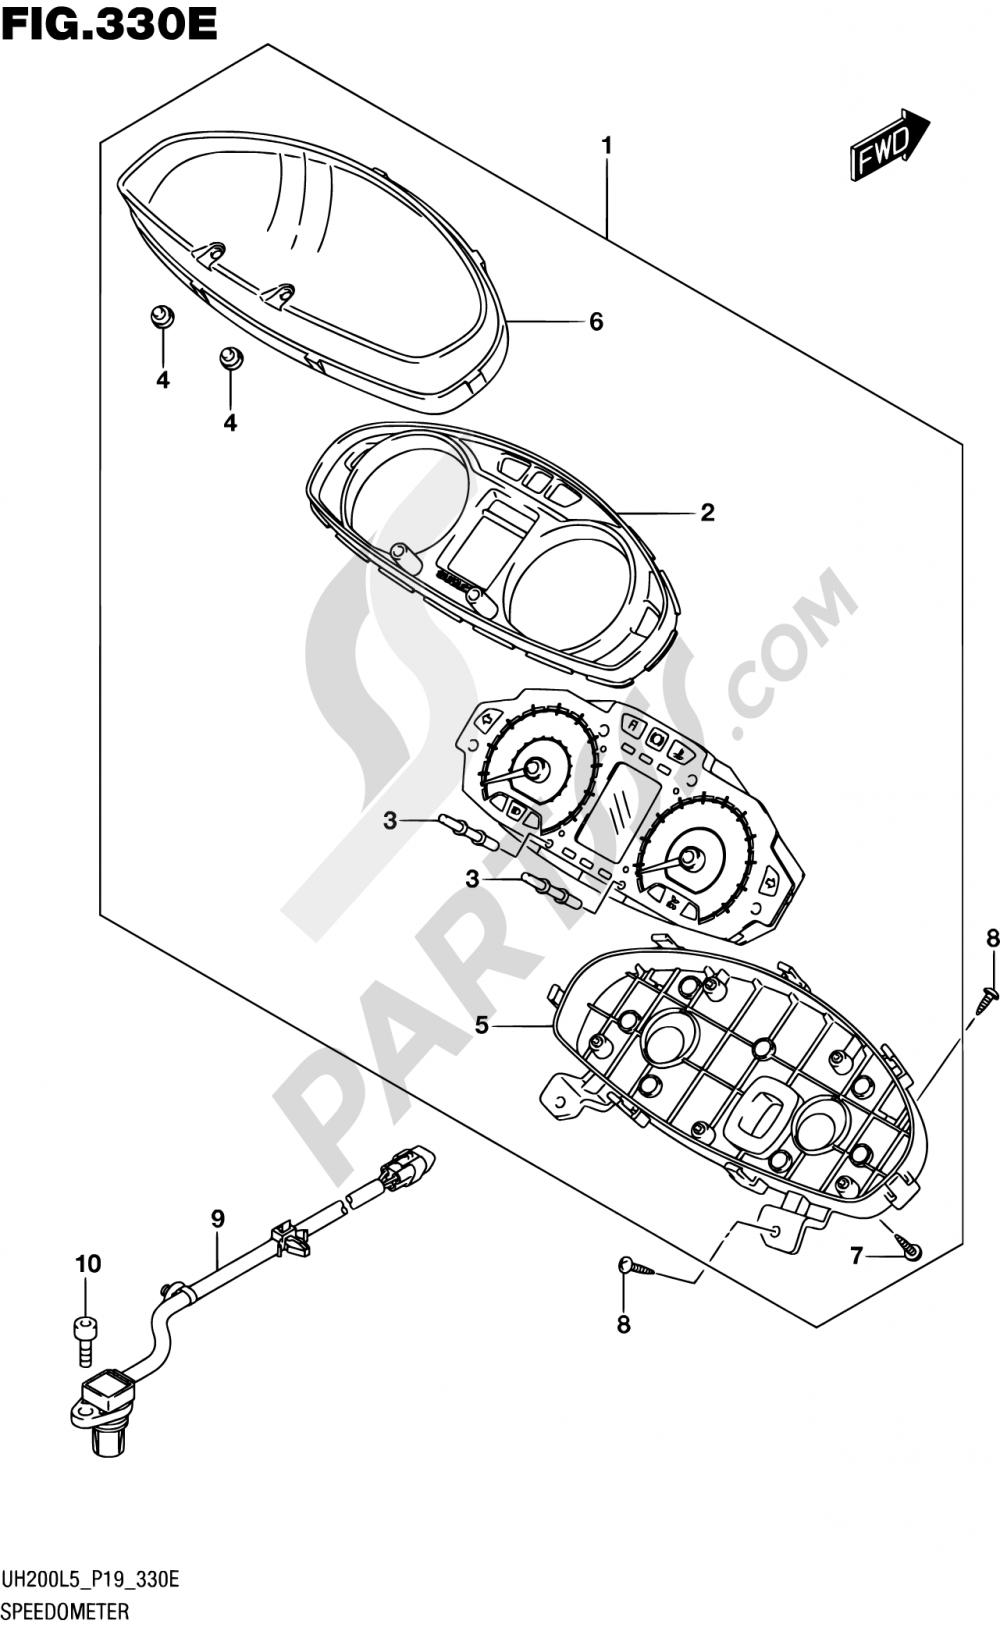 330E - SPEEDOMETER (UH200AL5 P04) Suzuki BURGMAN UH200A 2015